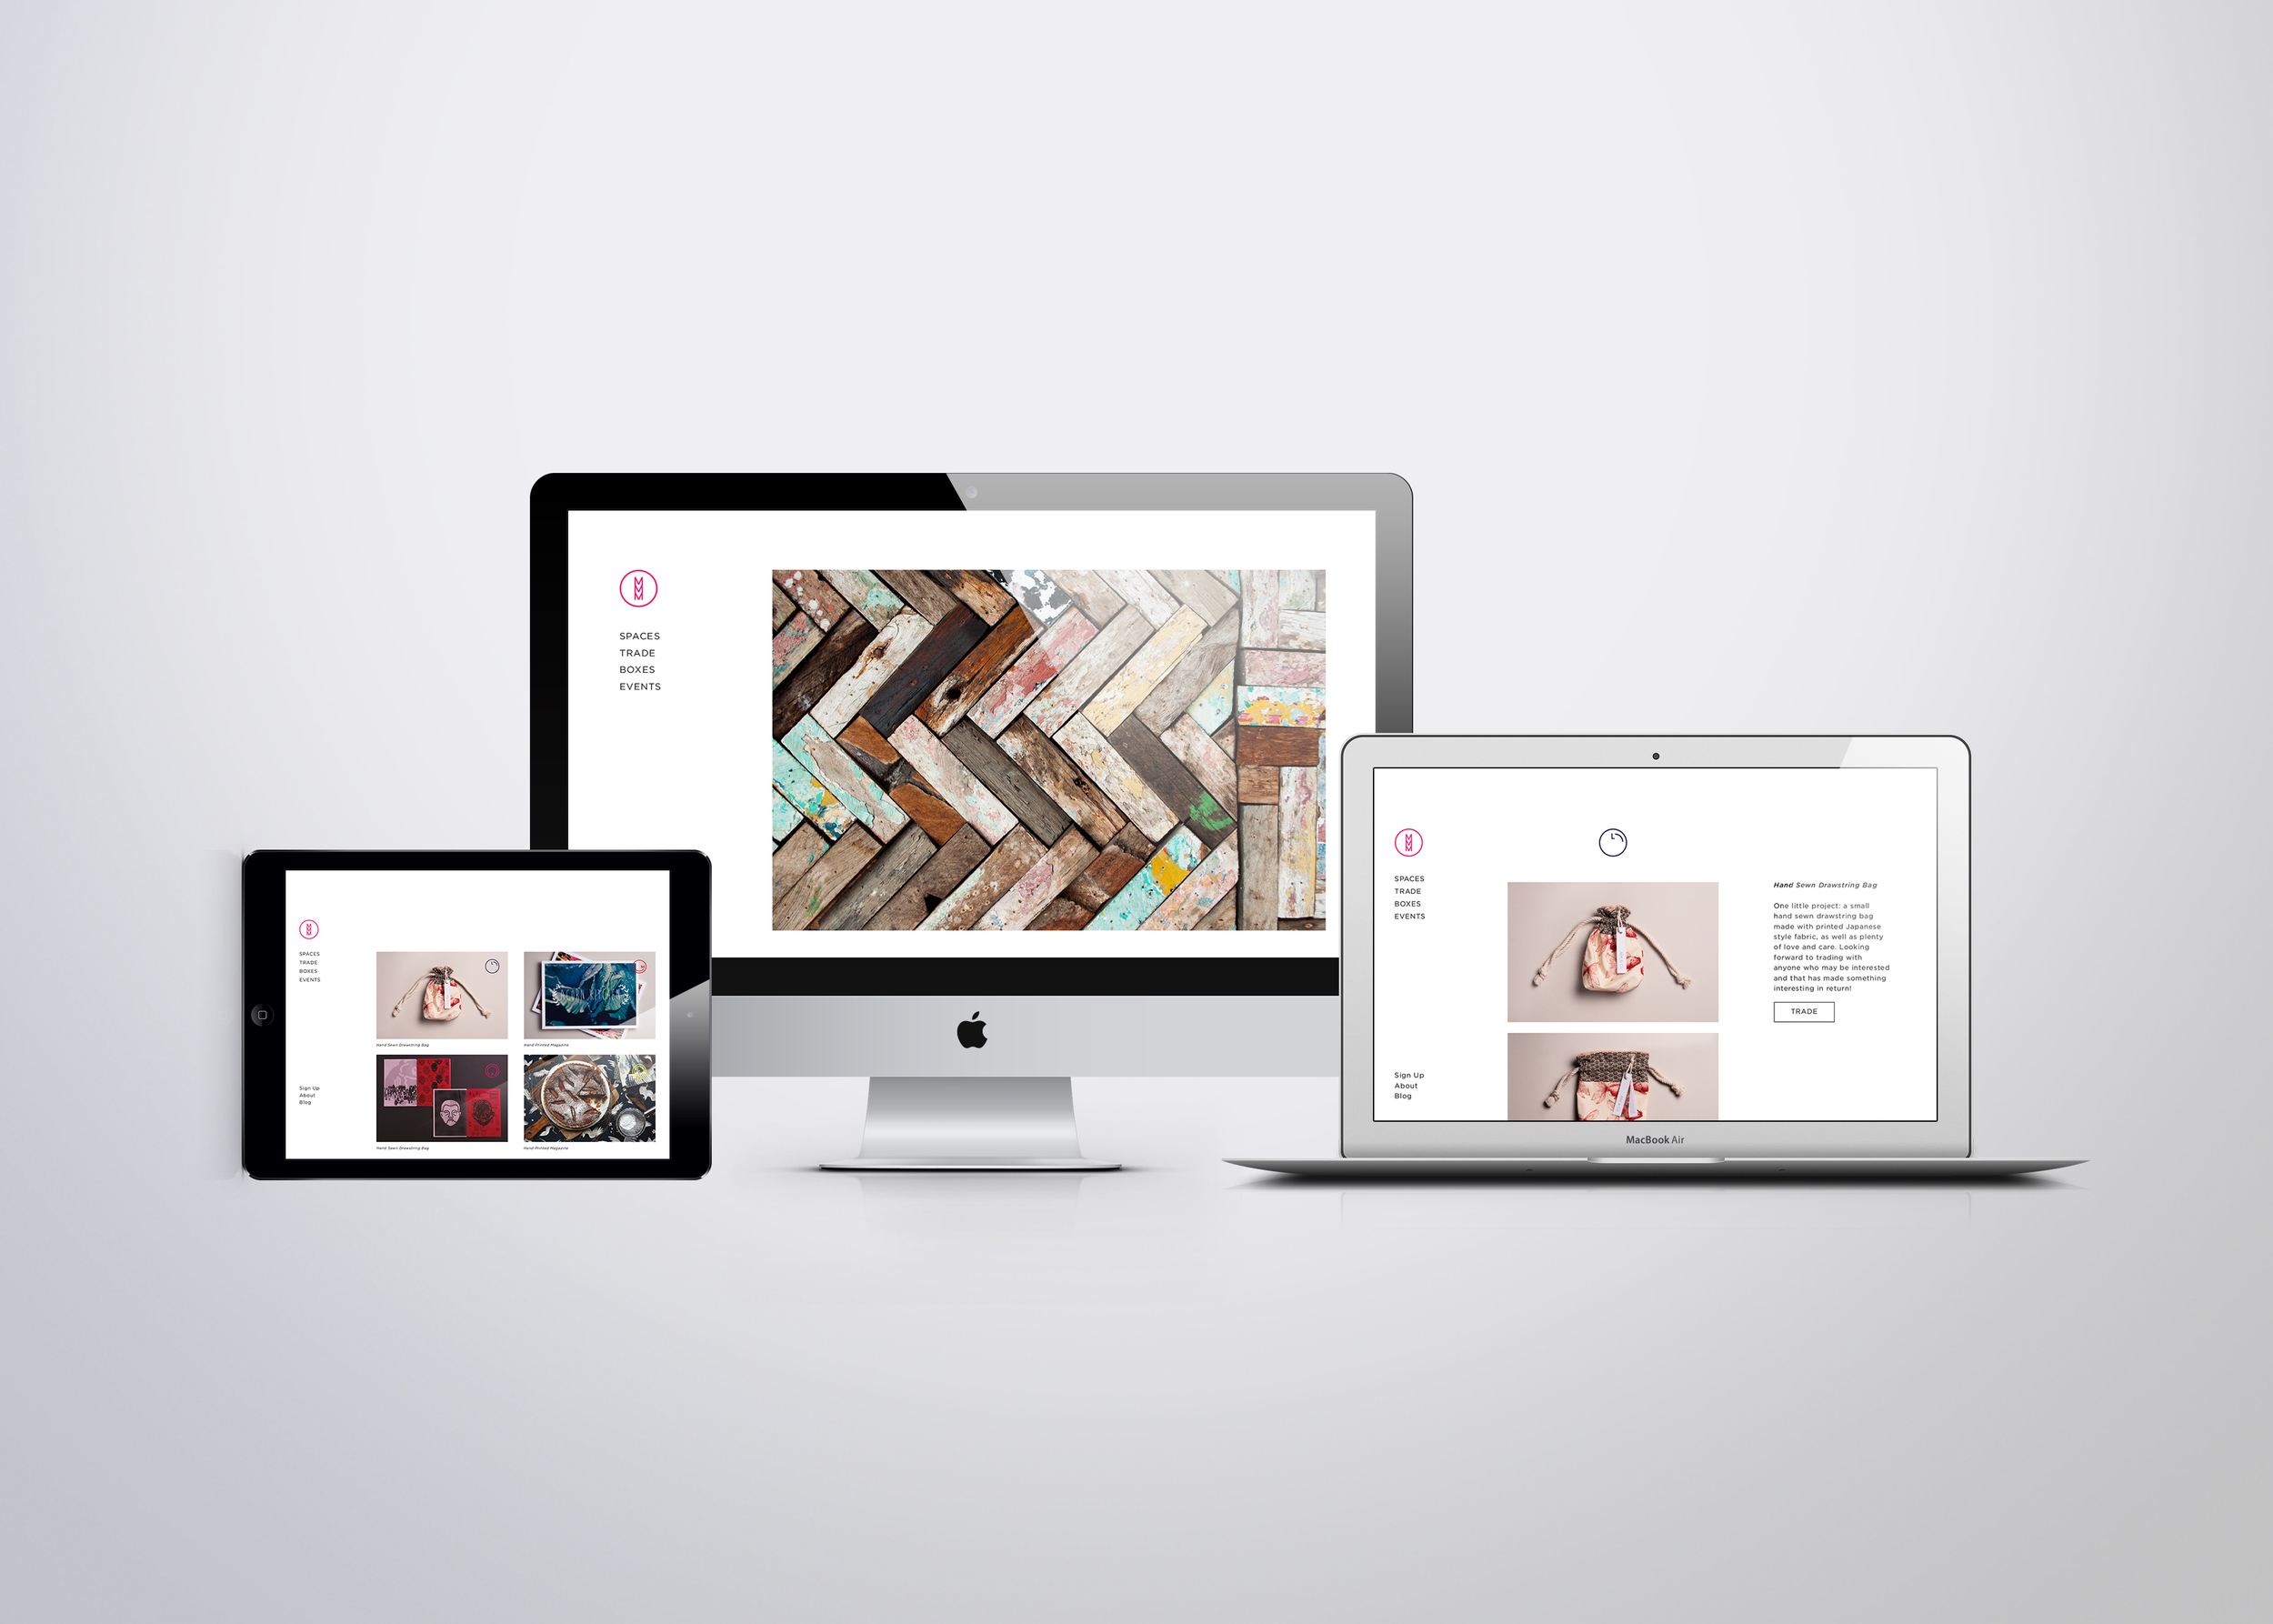 webmockup